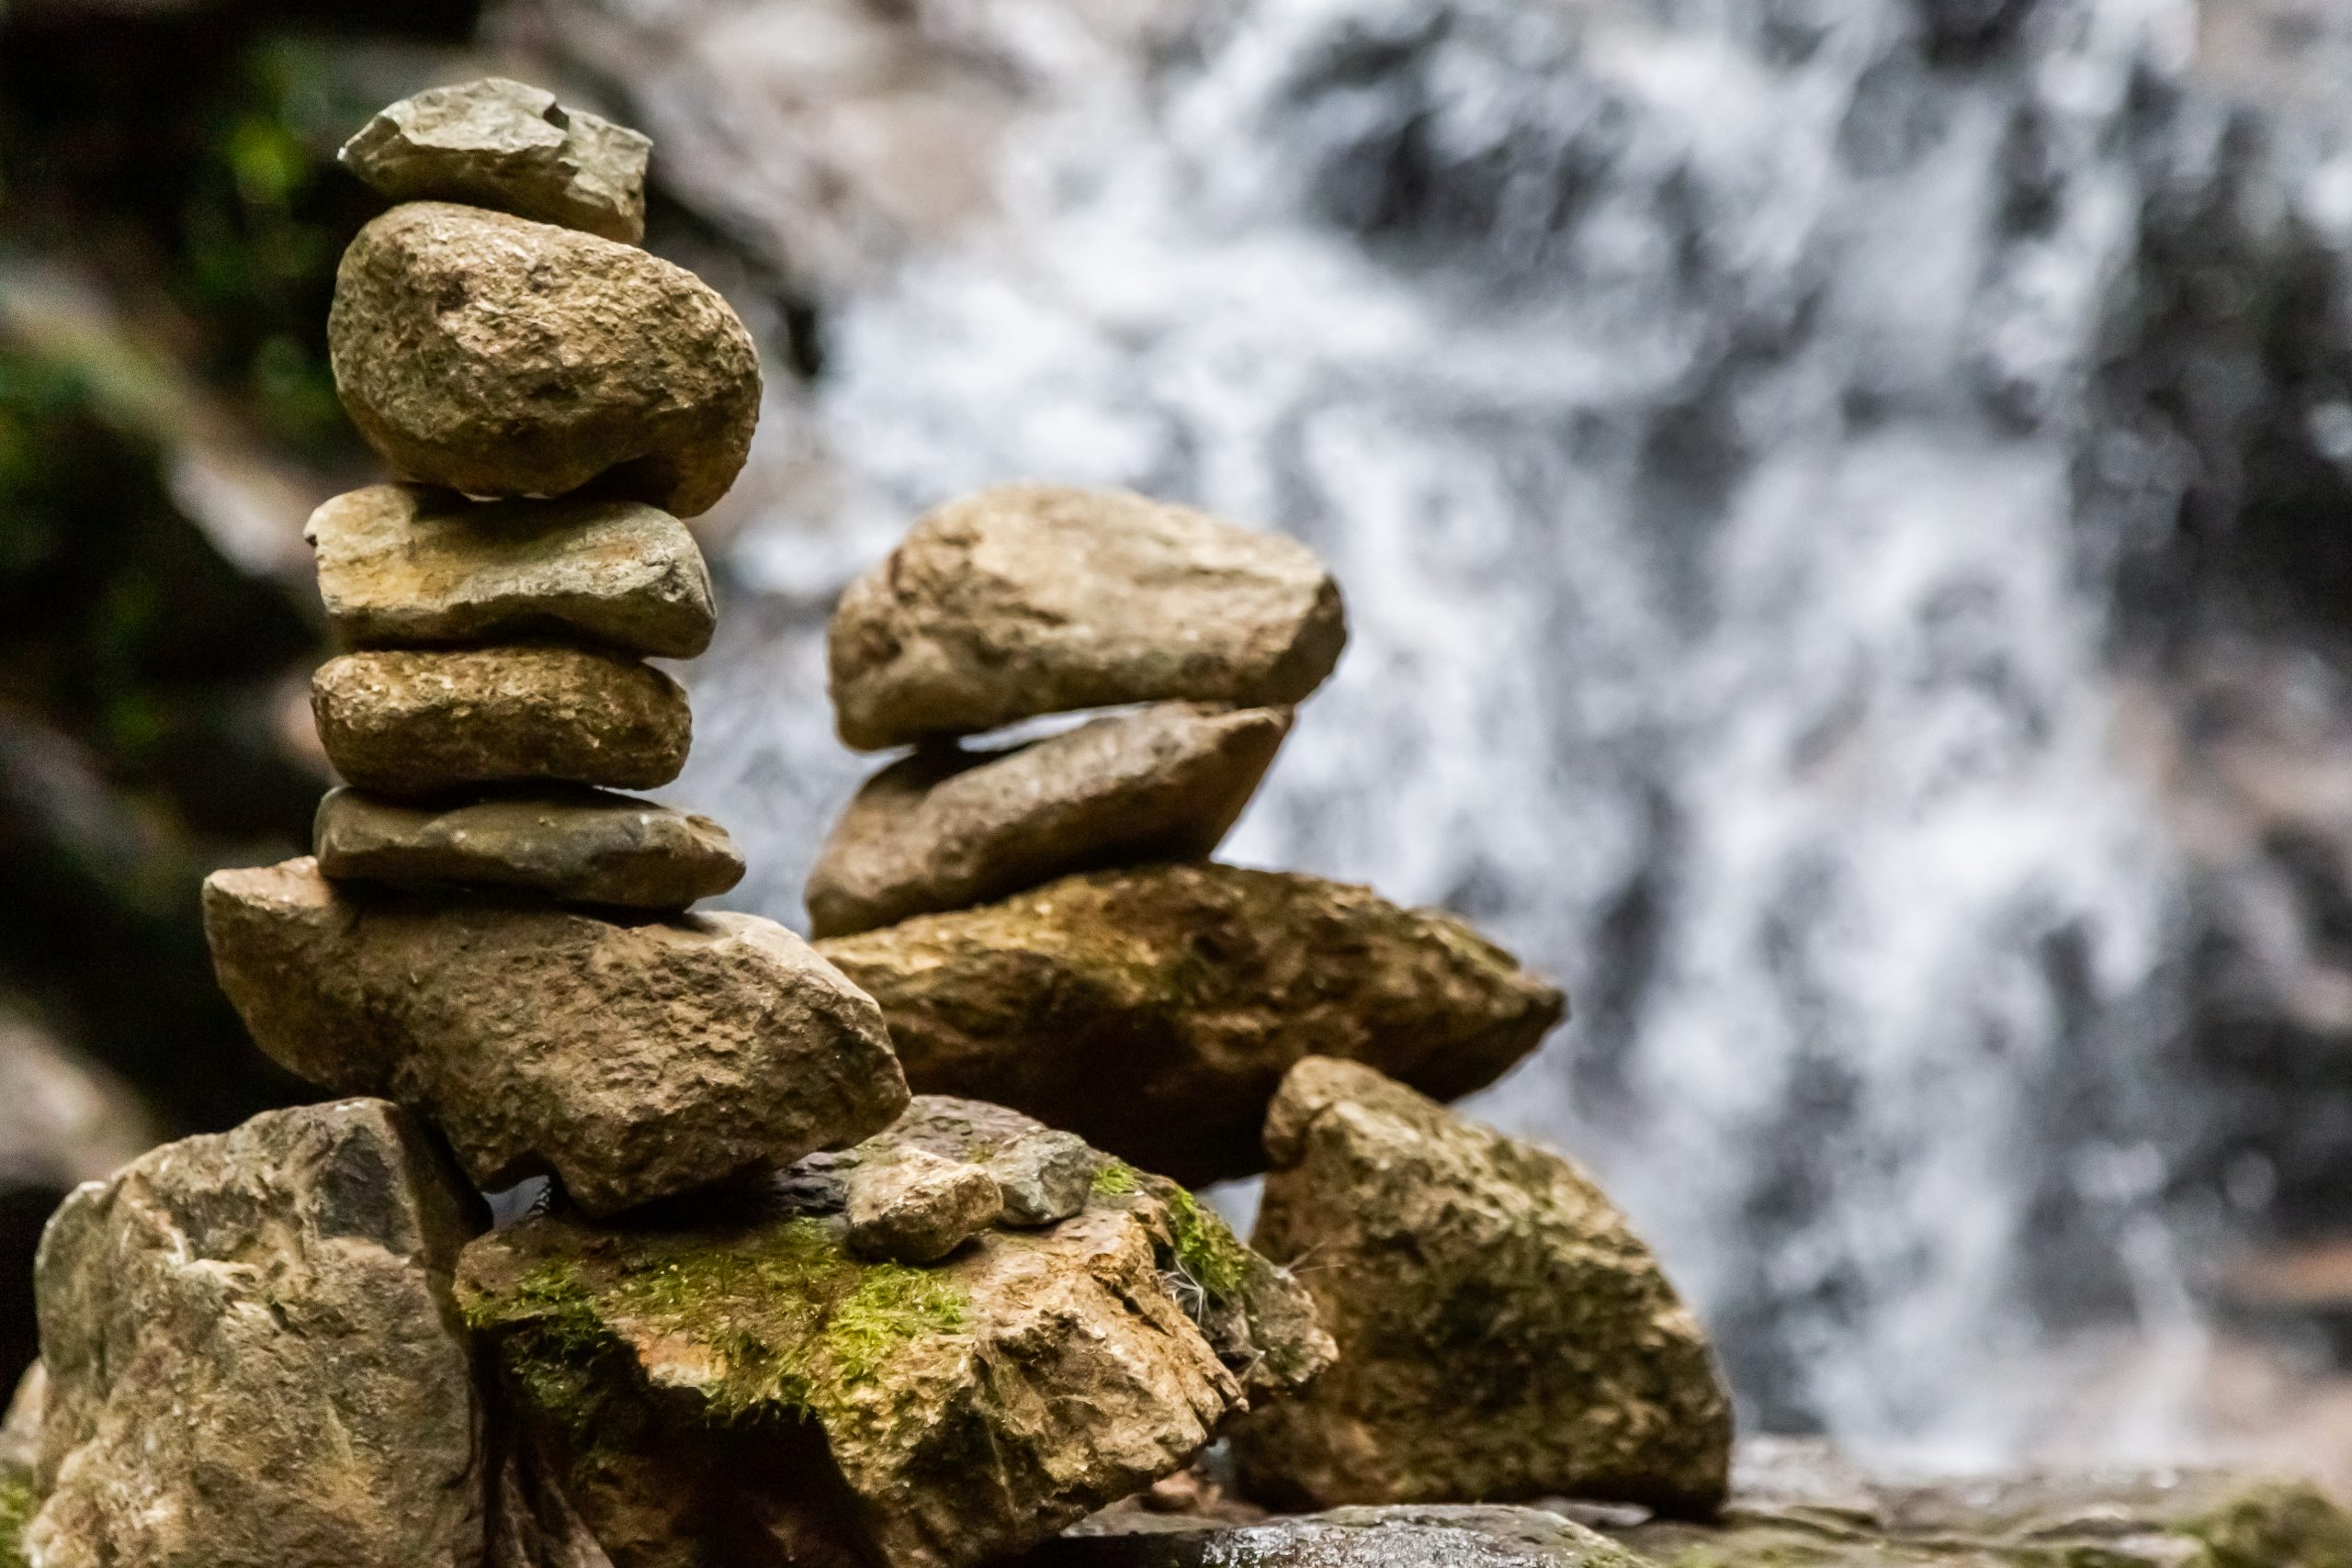 cairns at waterfall